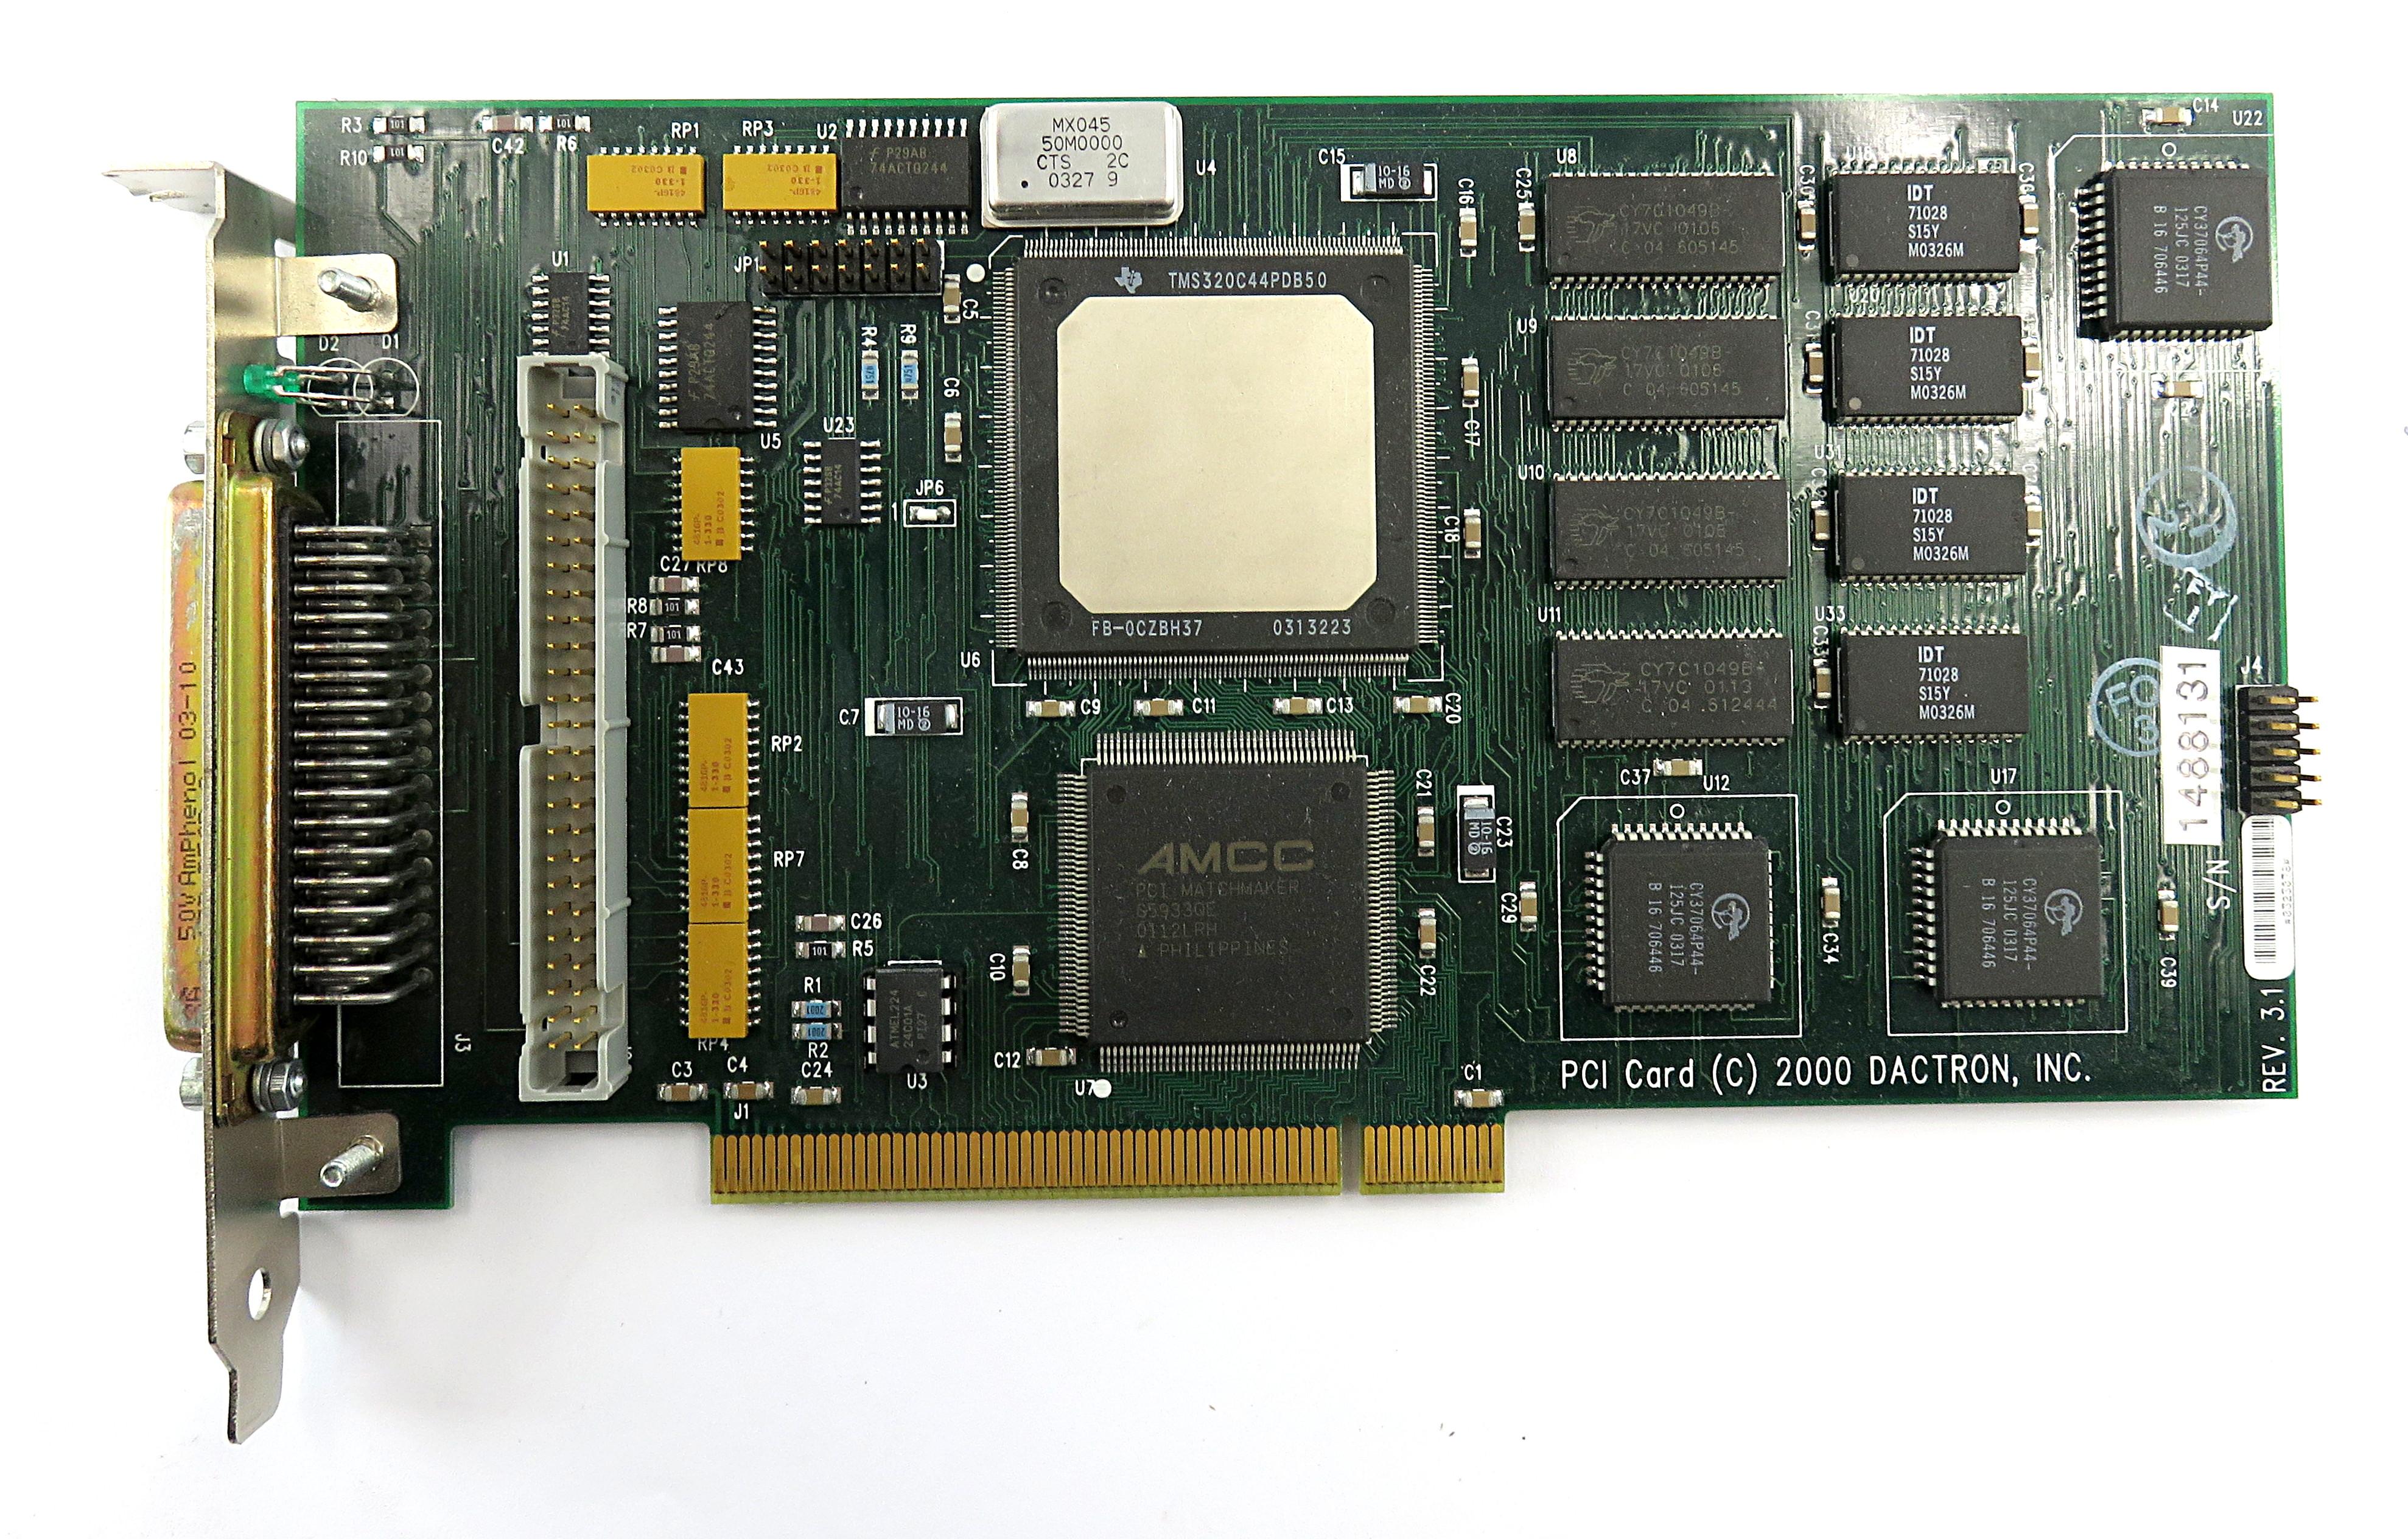 Dactron PCI Card 2000 REV.3.1 Interface Card